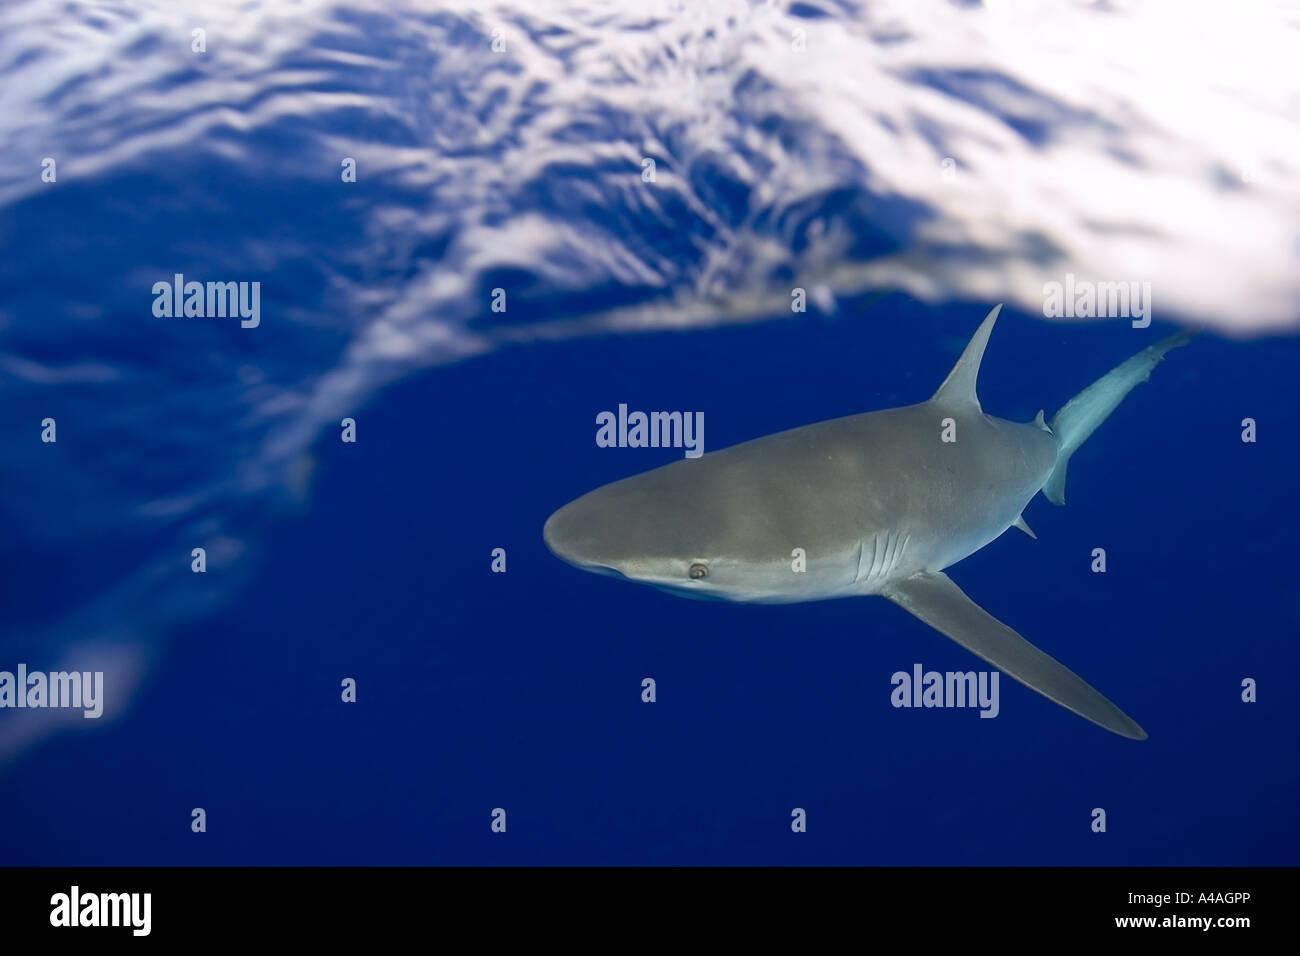 Galapagos shark Carcharhinus galapagensis Oahu Hawaii - Stock Image